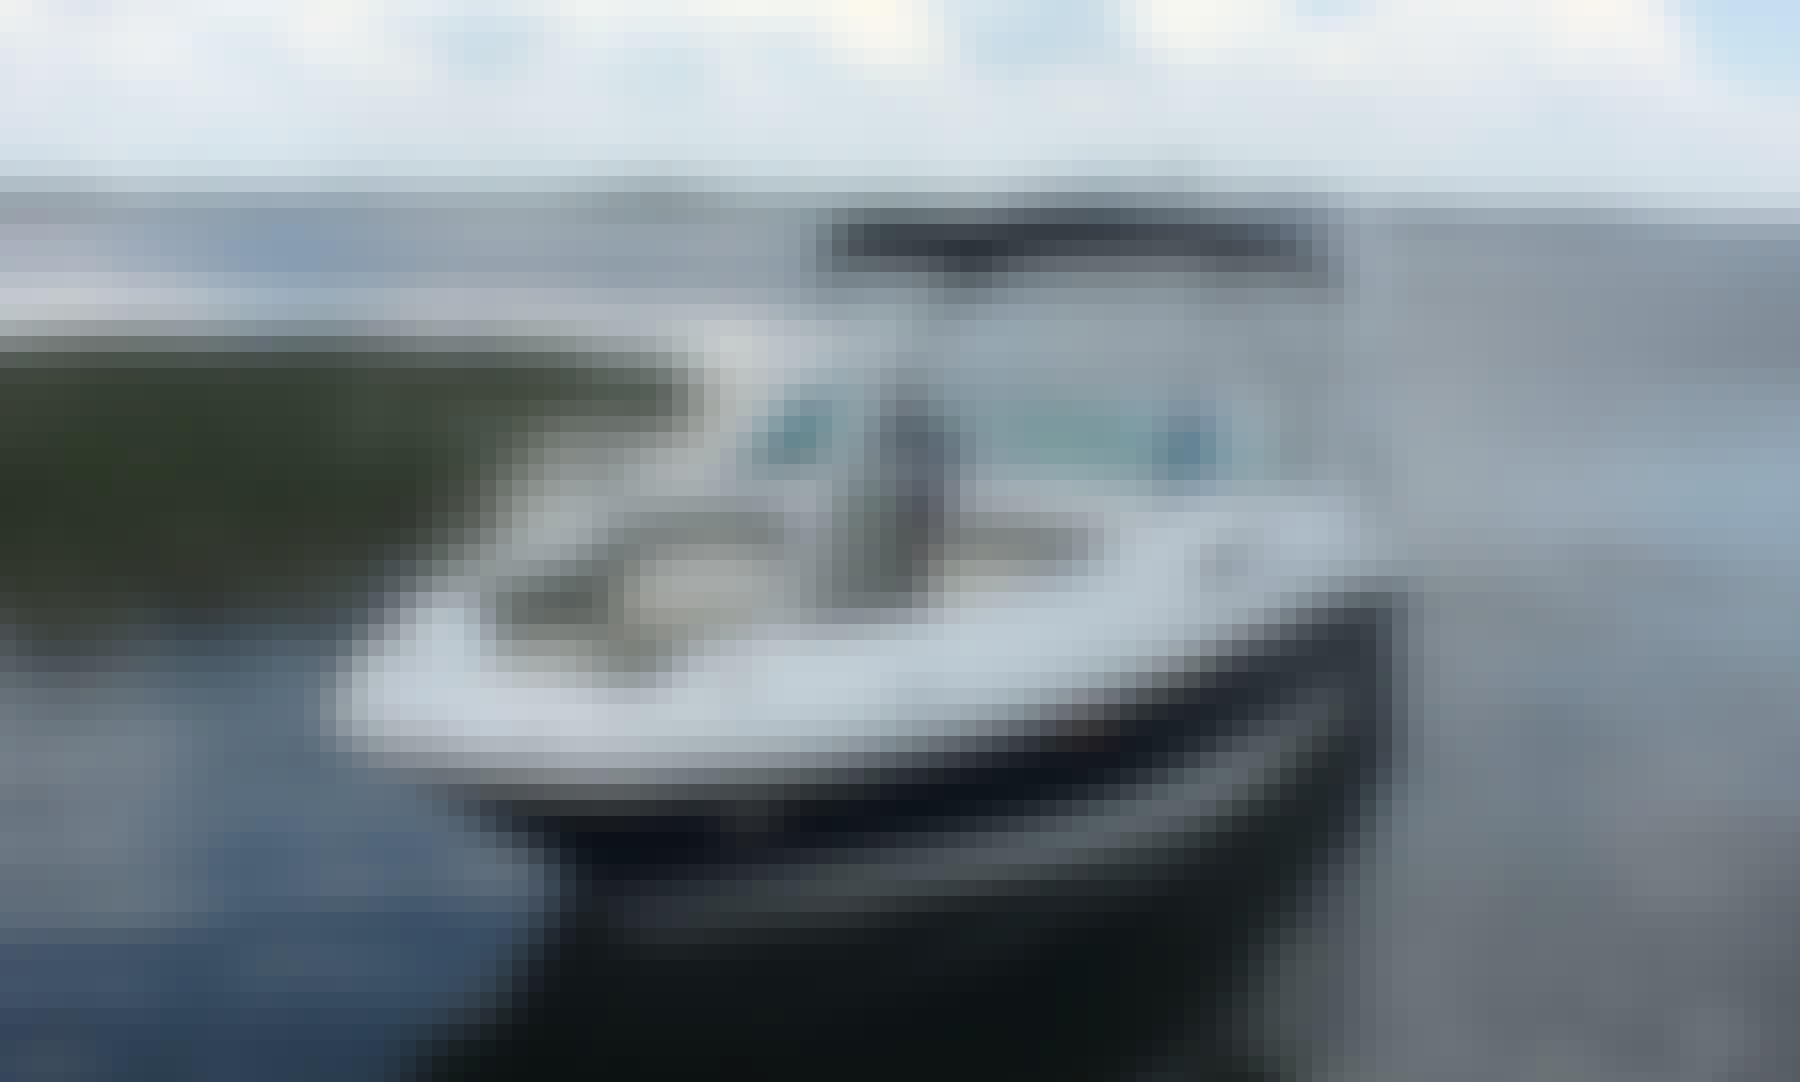 Sea Ray 240 Sundeck Boat In Marbella, Spain